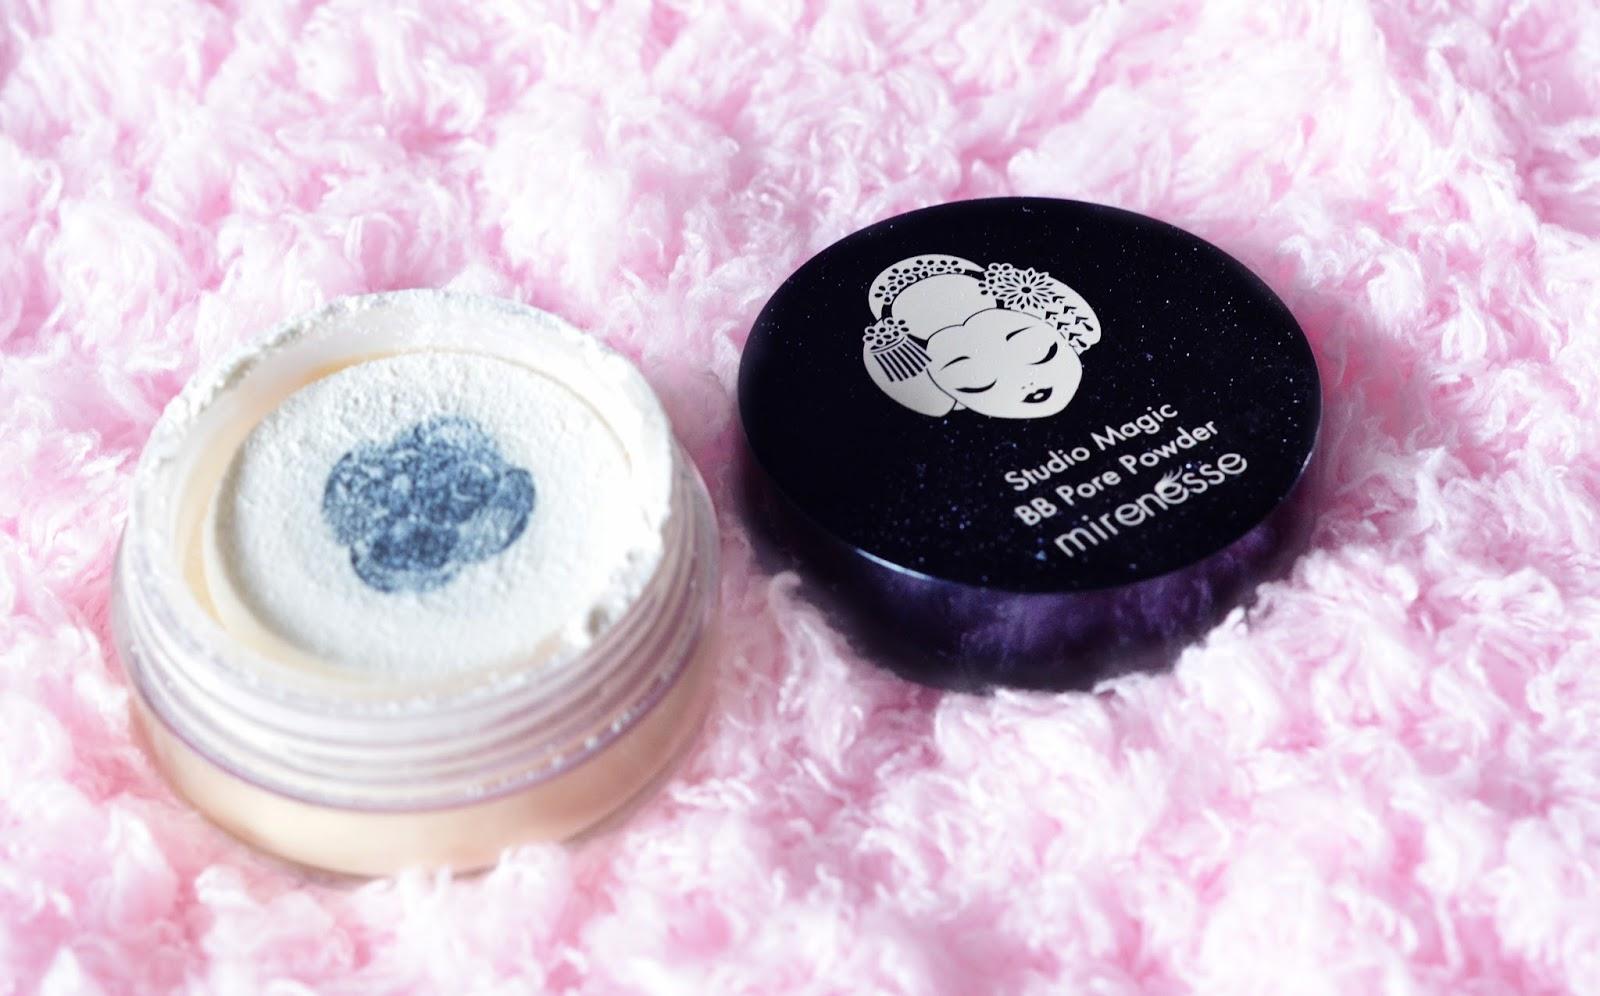 mirenesse studio magic bb pore powder